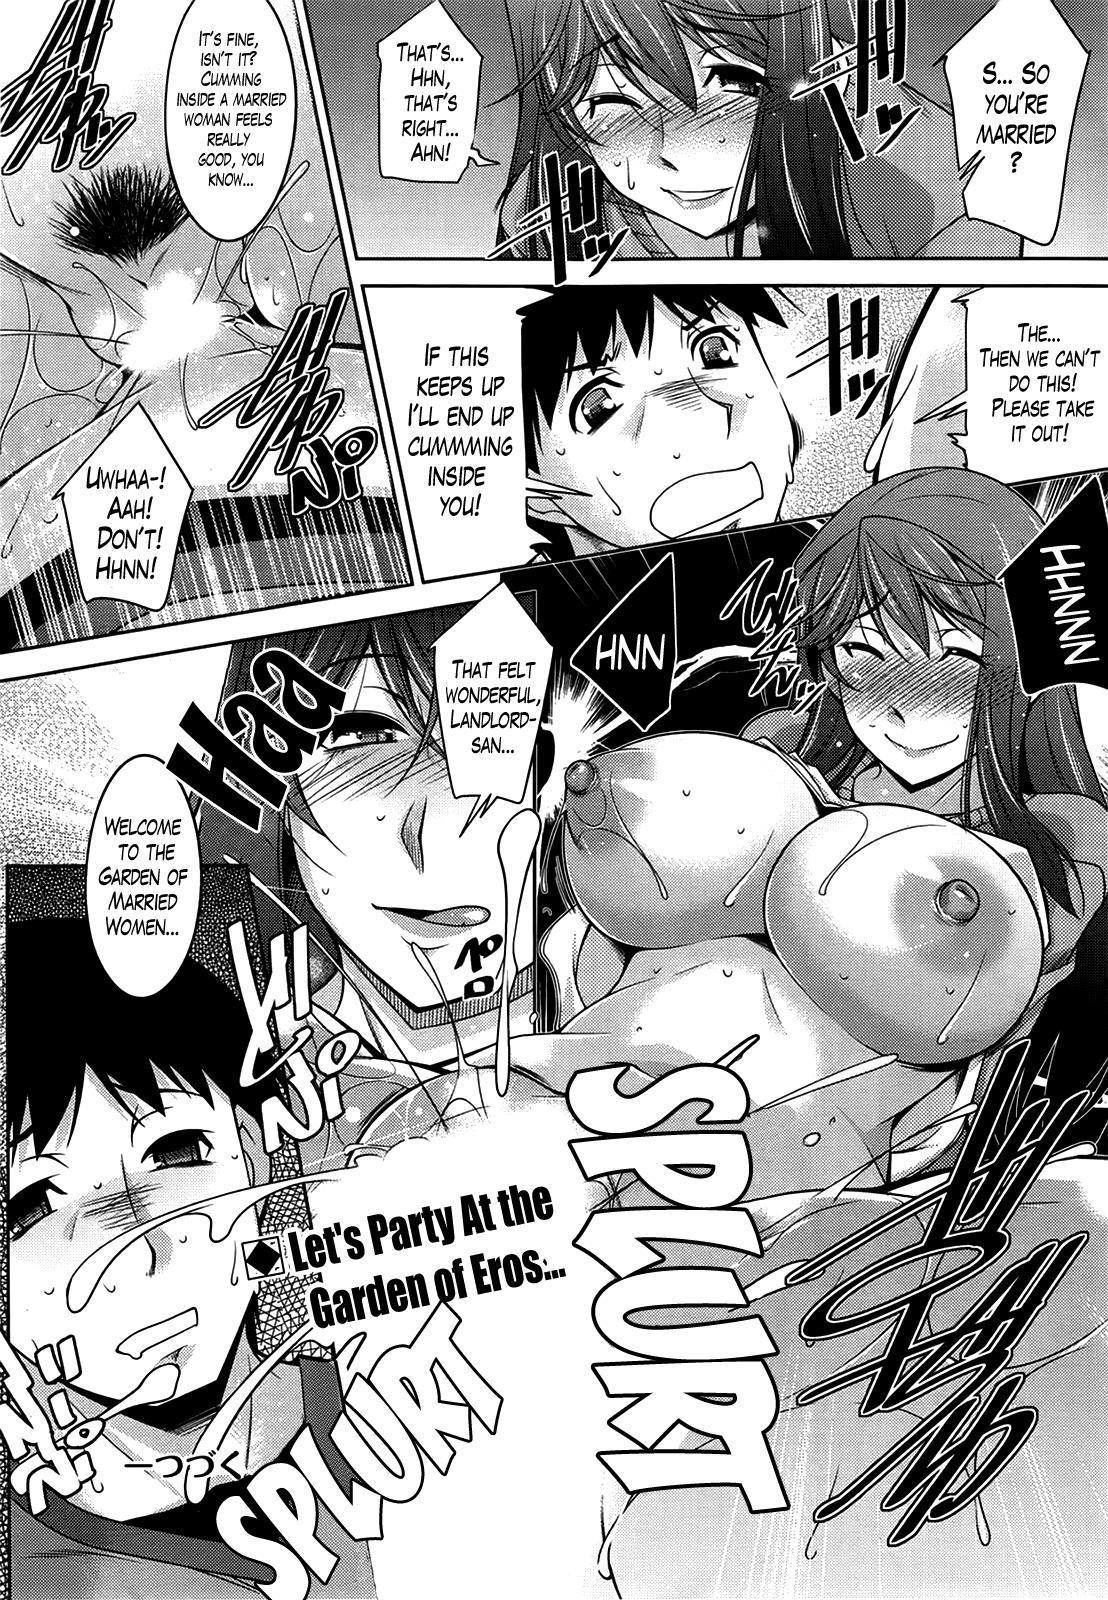 [Zen9] Taikutsu na Gogo no Sugoshikata Ch. 1-5   A Way to Spend a Boring Afternoon Ch. 1-5 (Action Pizazz DX 2013-12) [English](hentai2read.com)[Lazarus H] 18